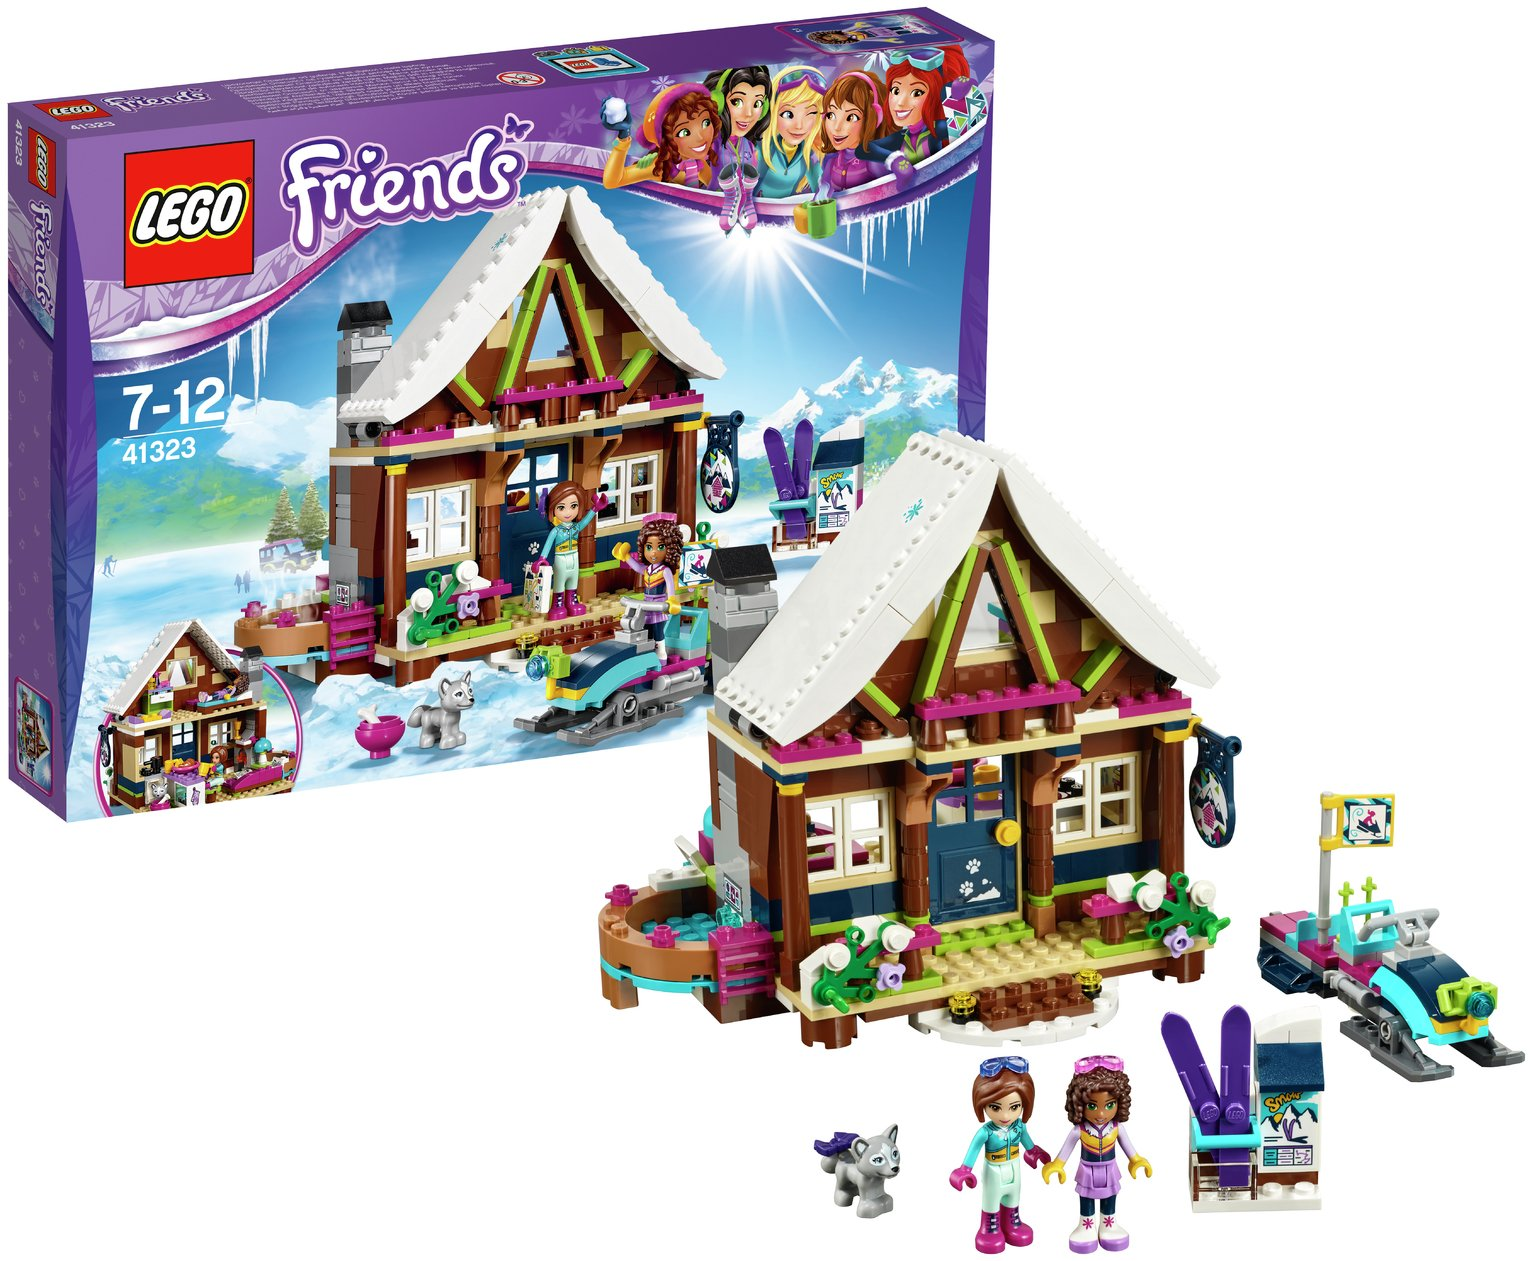 LEGO Friends Snow Resort Chalet - 41323